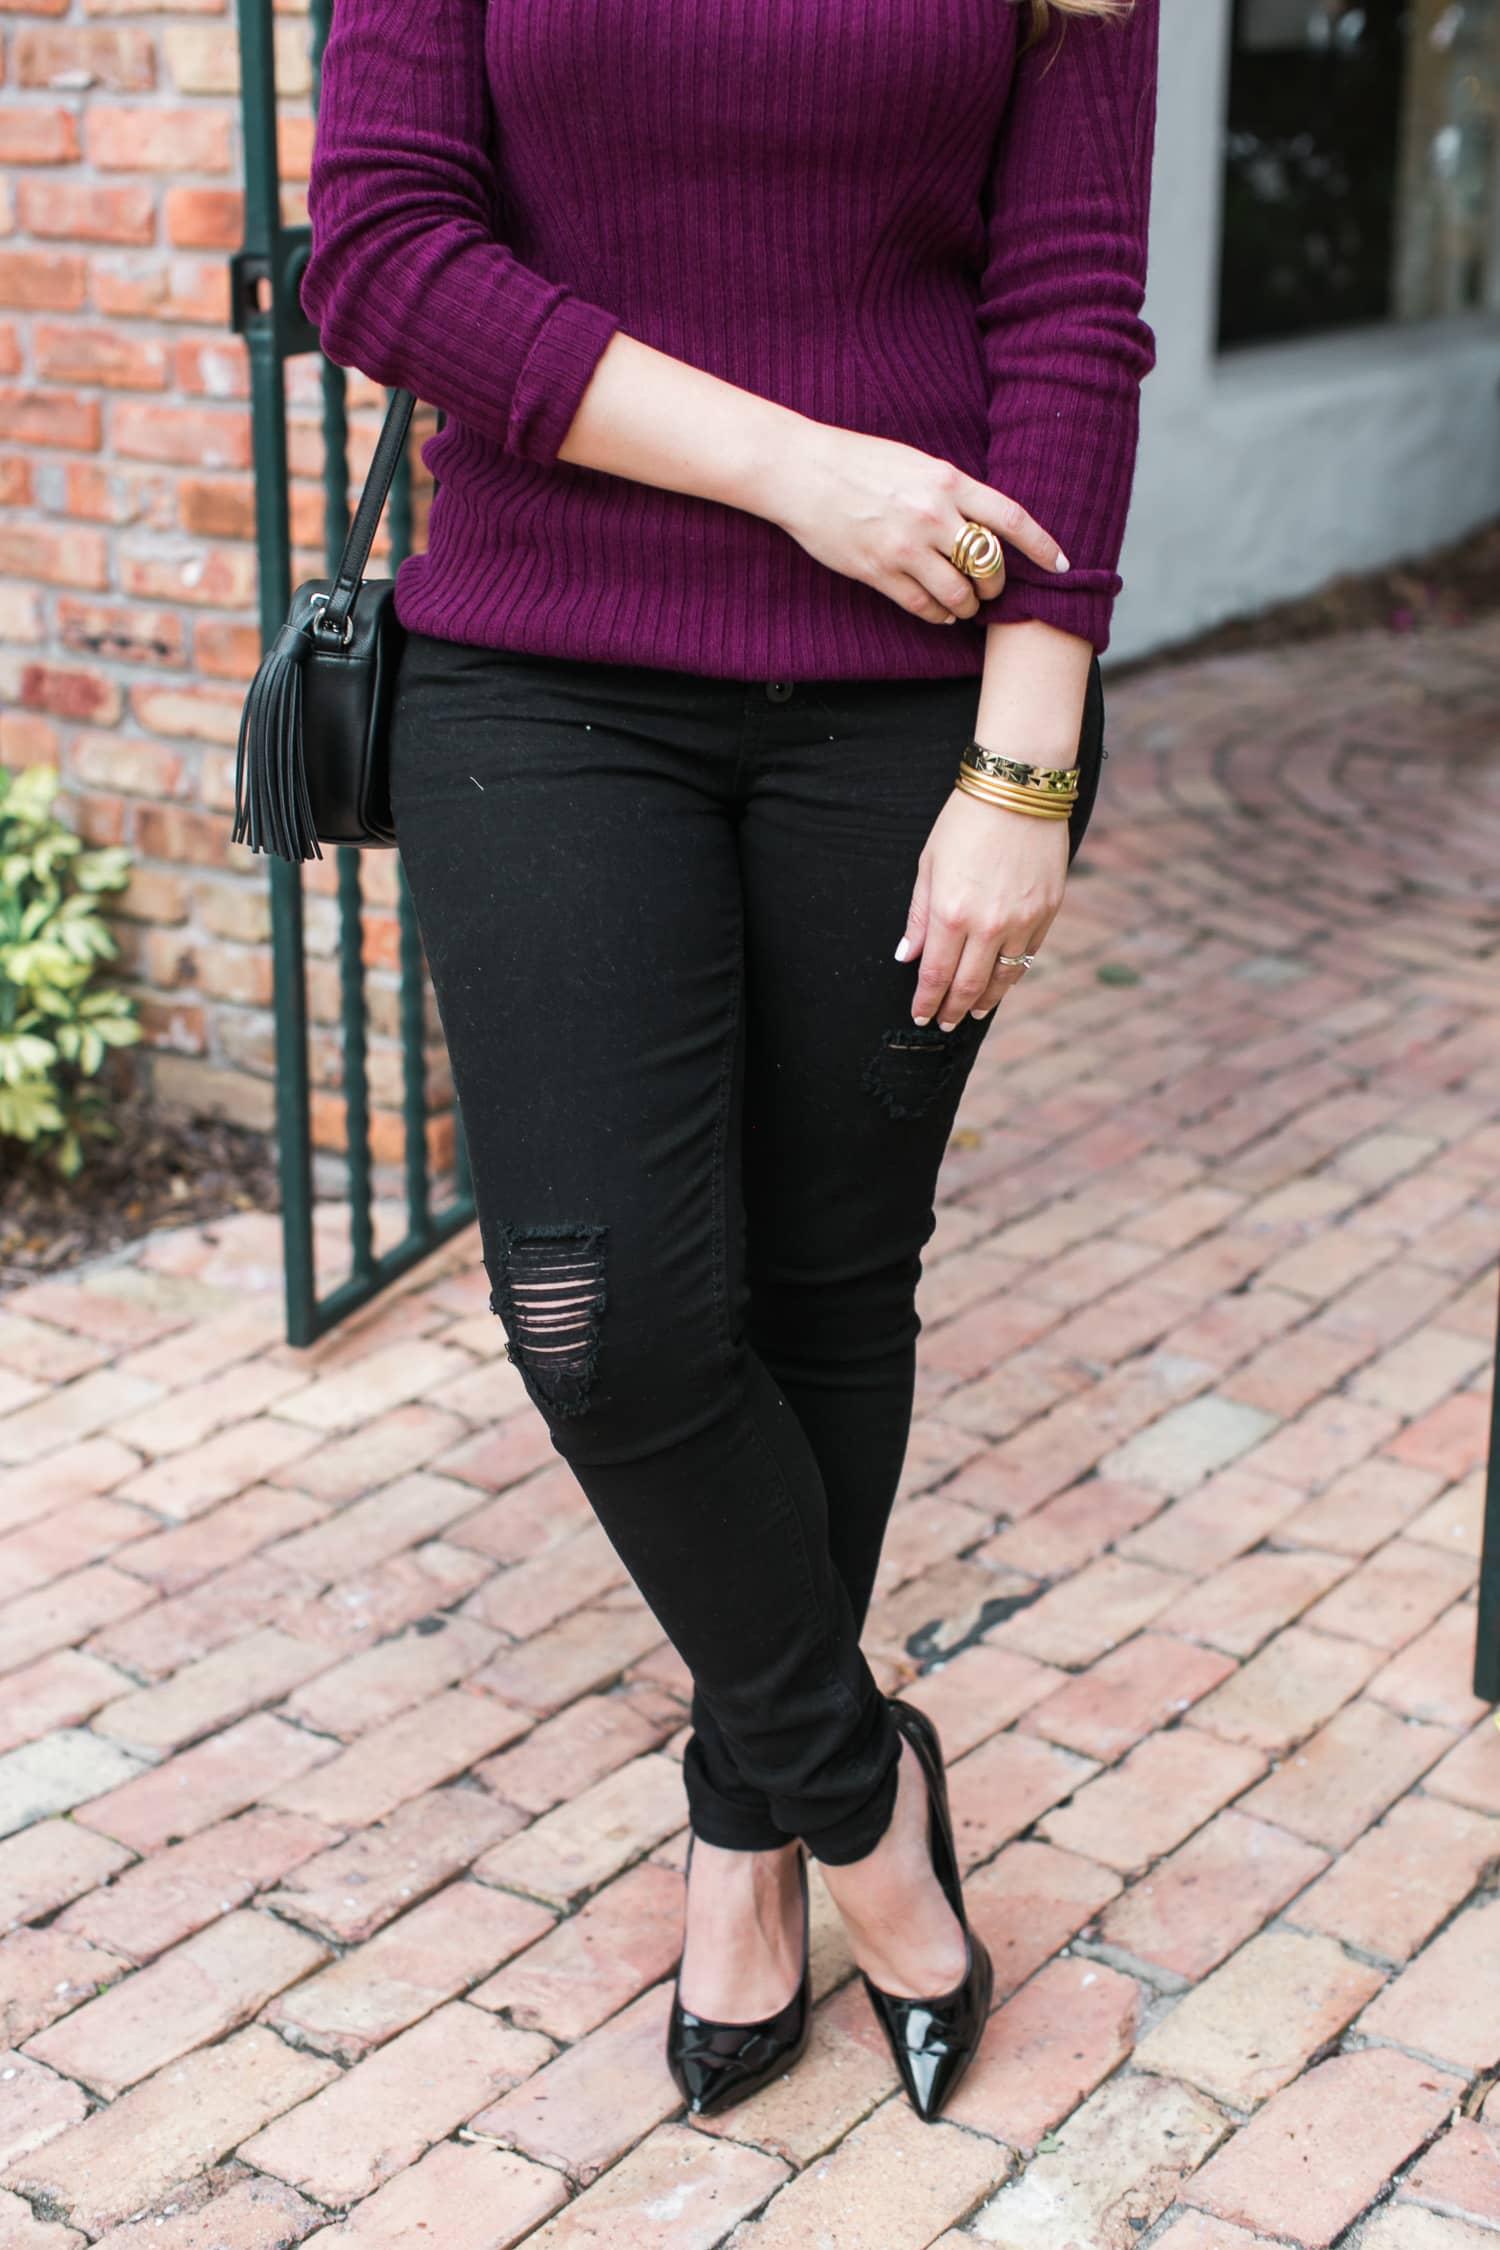 black-ripped-jeans-retro-round-sunglasses-burgundy-cashmere-sweater-black-pointy-toe-pumps-tassel-handbag-030